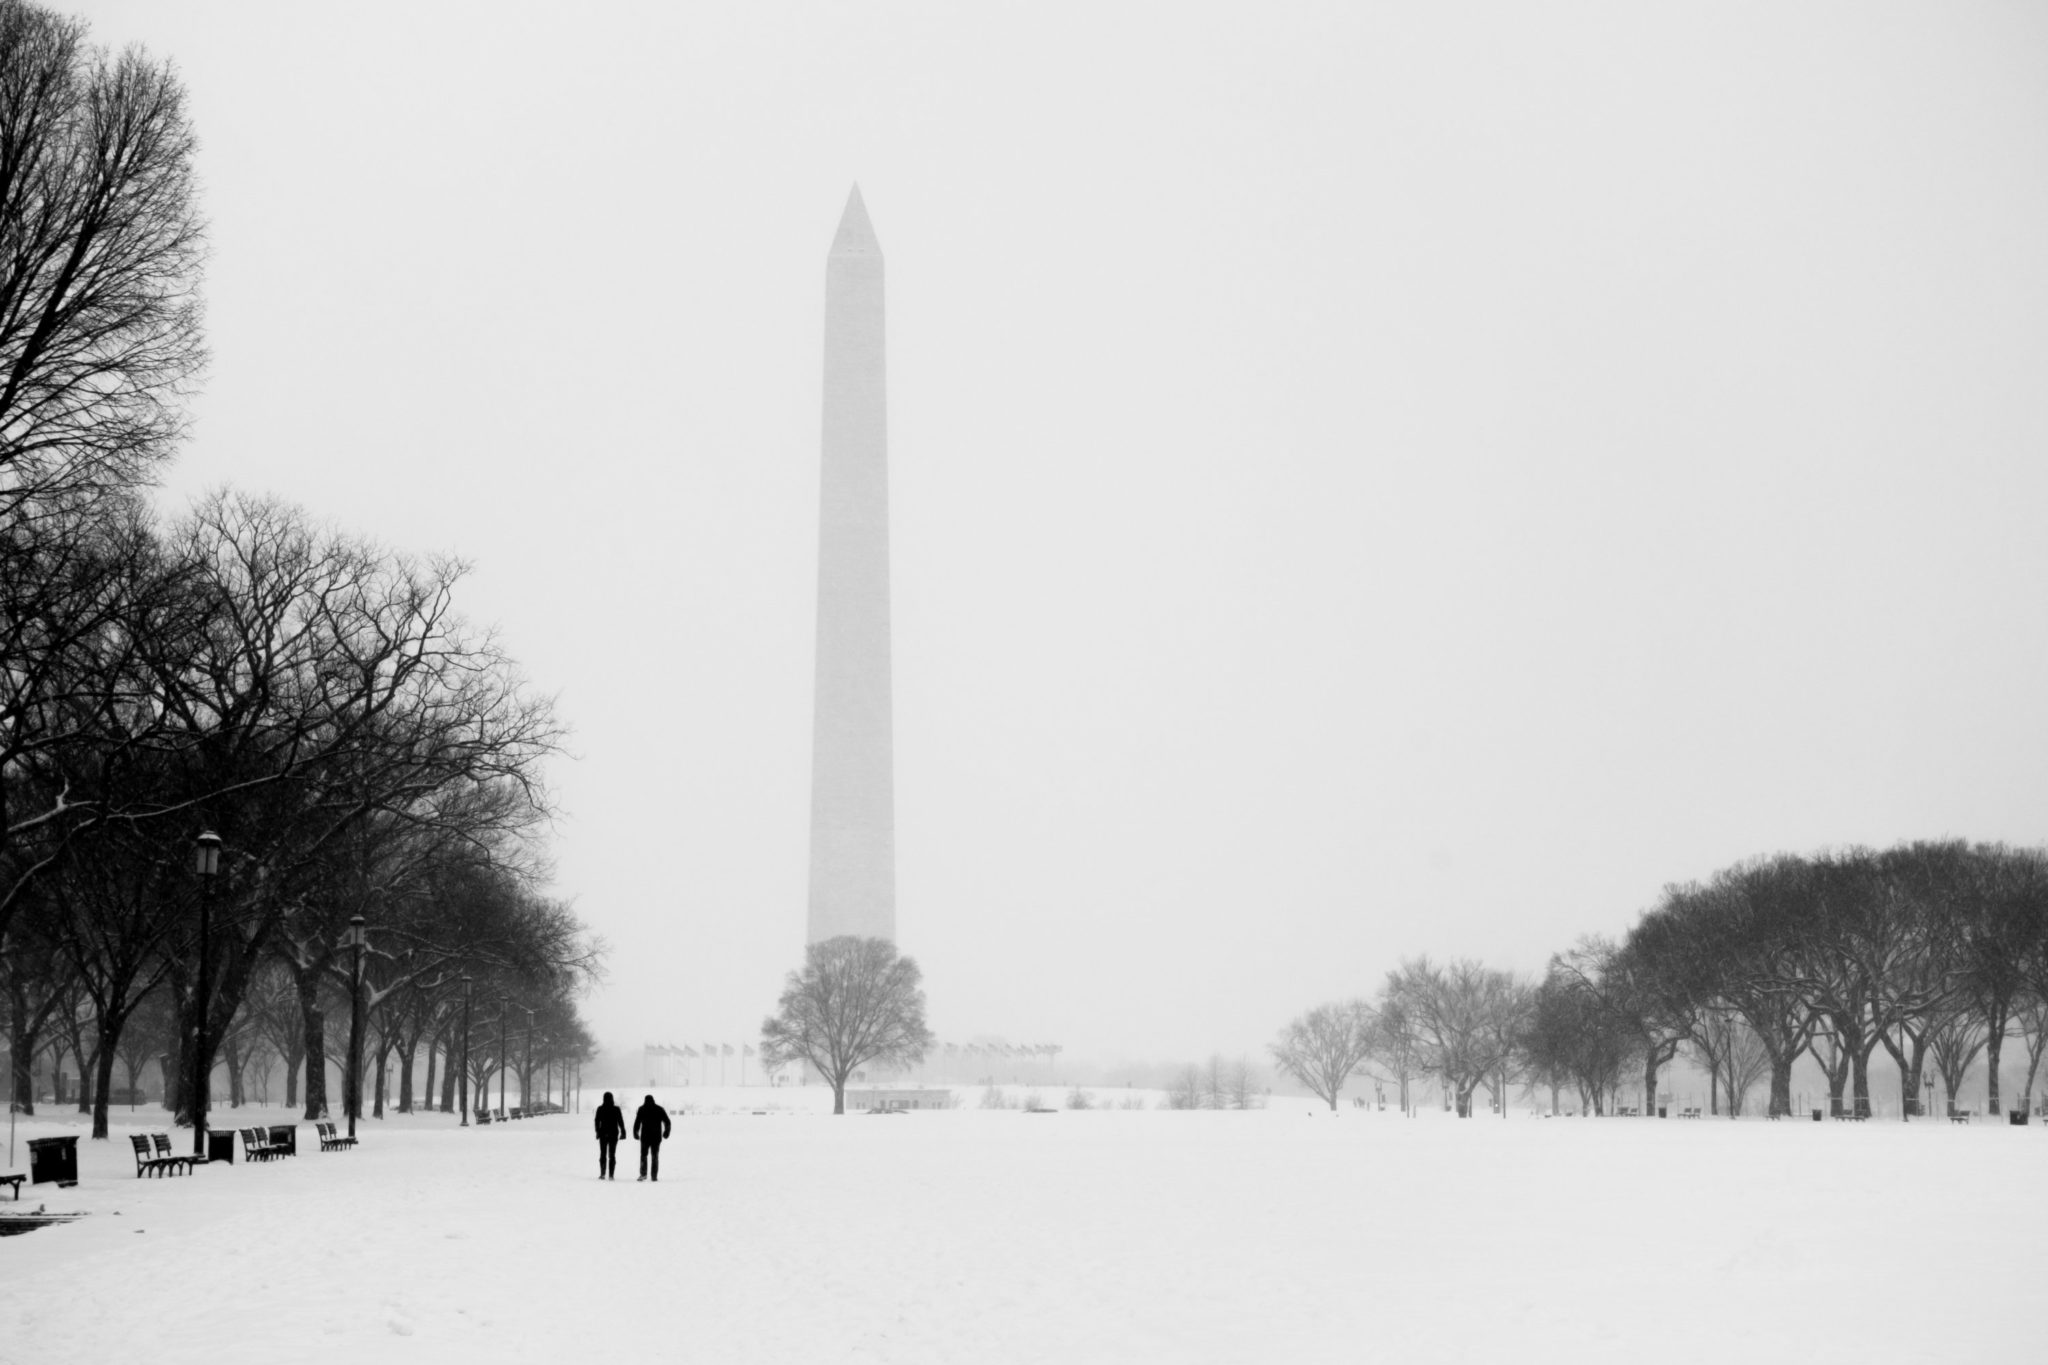 Washington, DC, snow. Photograph via iStock.